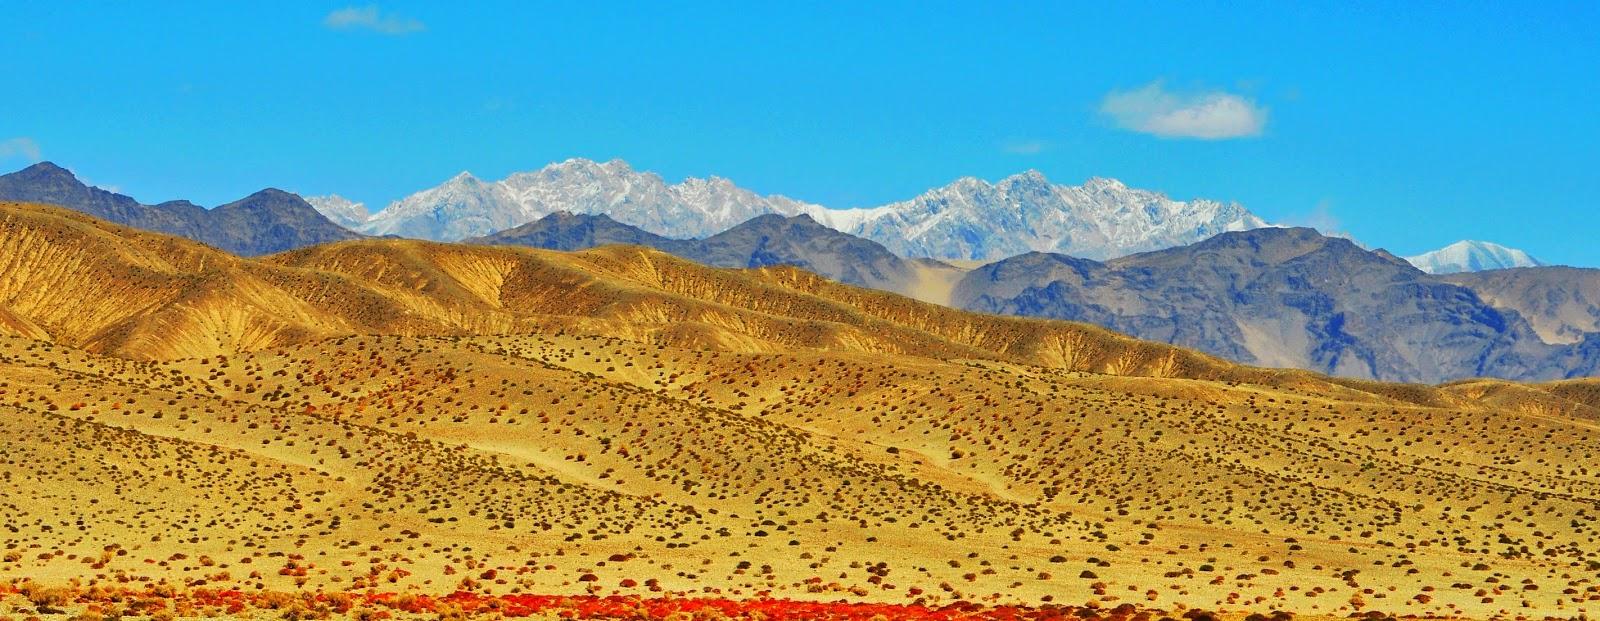 Qaidam Basin – The Mineral Rich Basin of China | China ...Qaidam Basin Geology